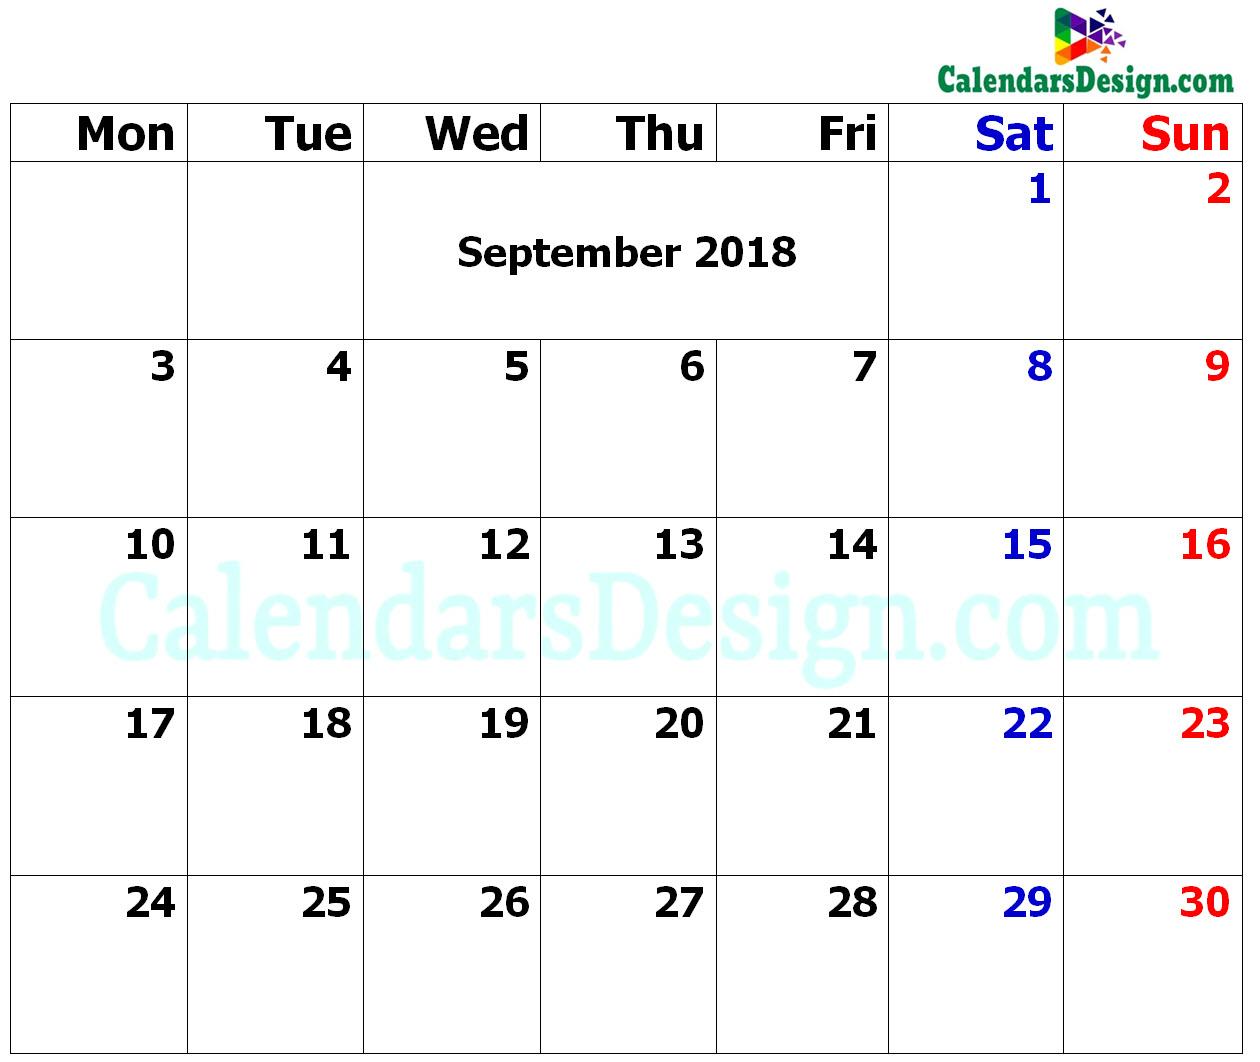 September Calendar 2018 in Excel Format